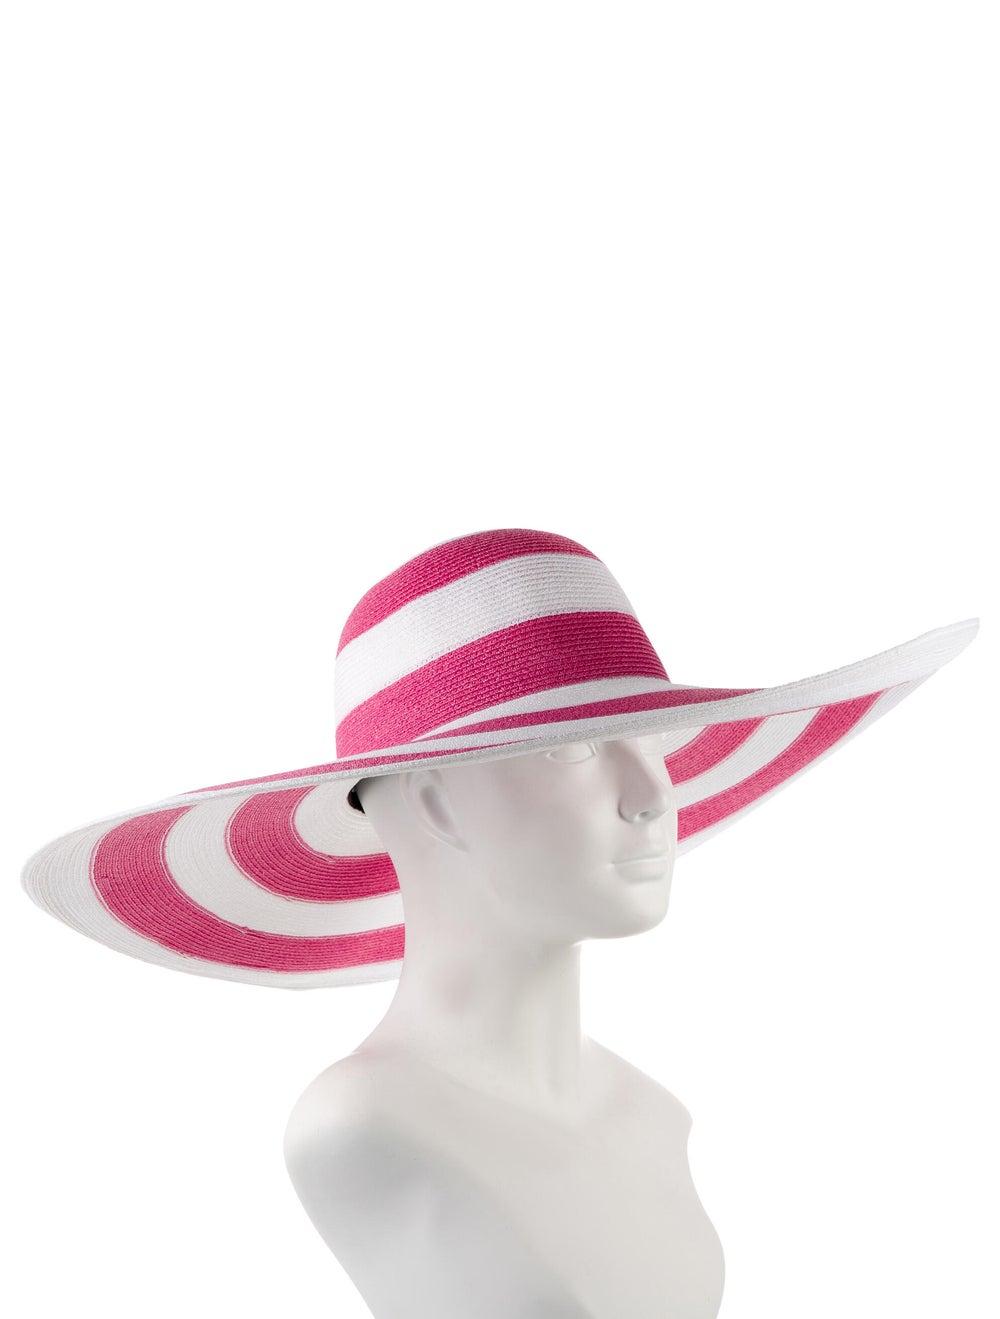 Eugenia Kim Straw Wide-Brim Hat Pink - image 3